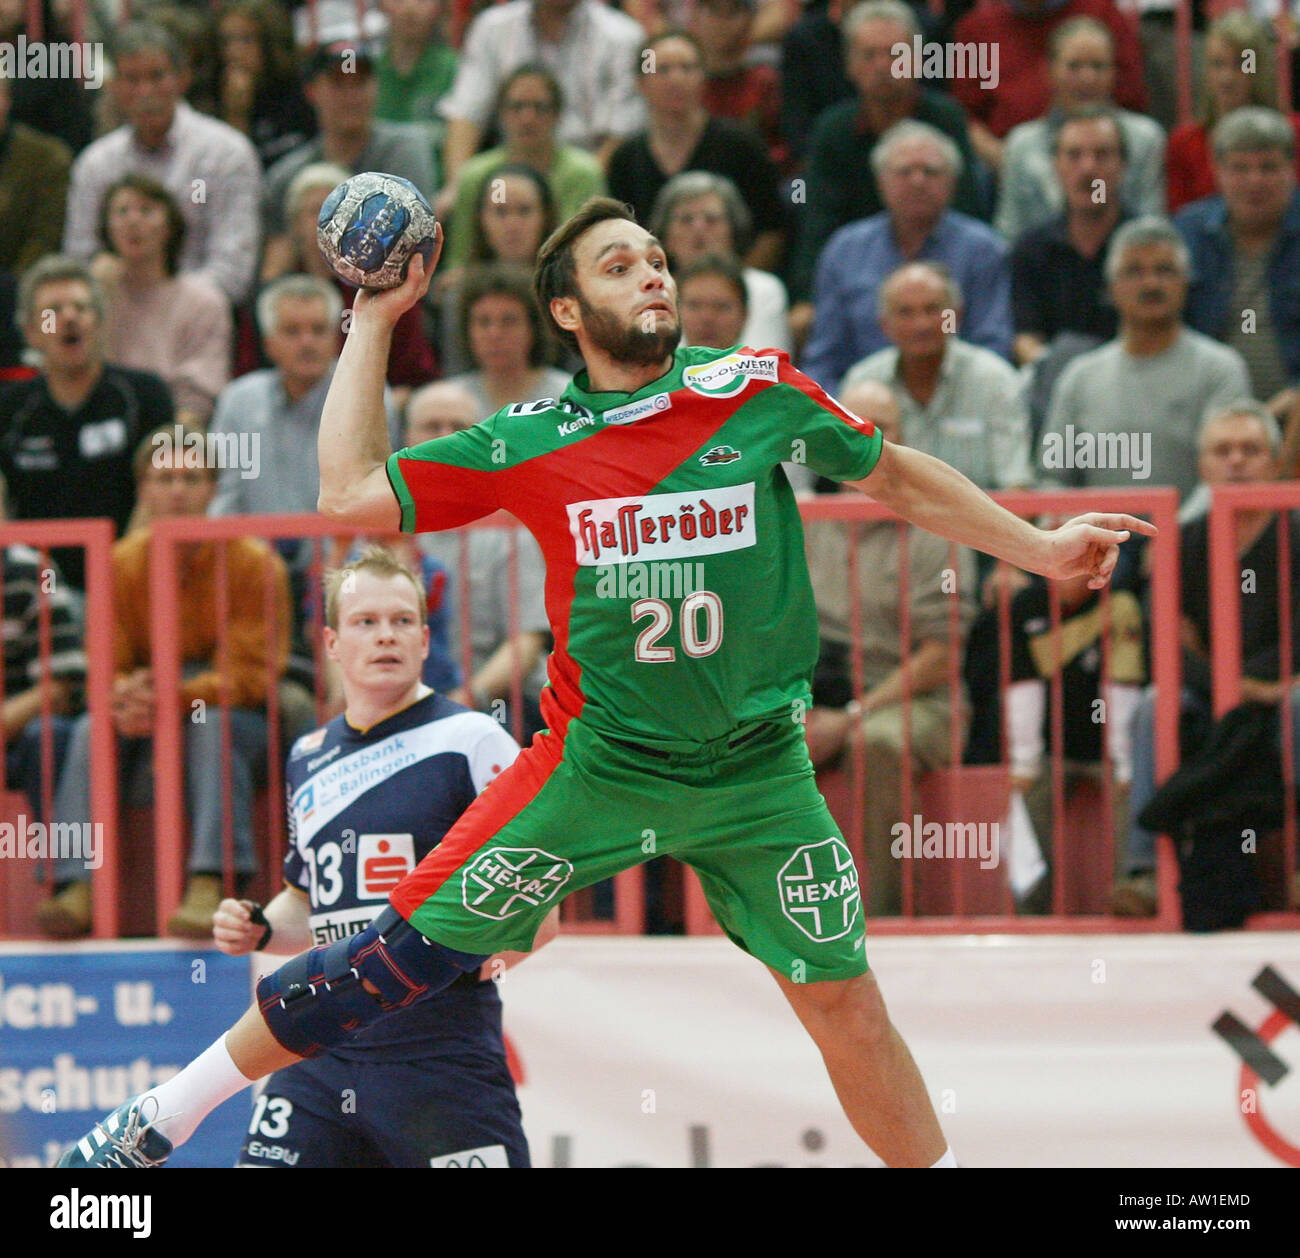 Oleg Kulechow (Magdeburg) throwing a goal - Stock Image